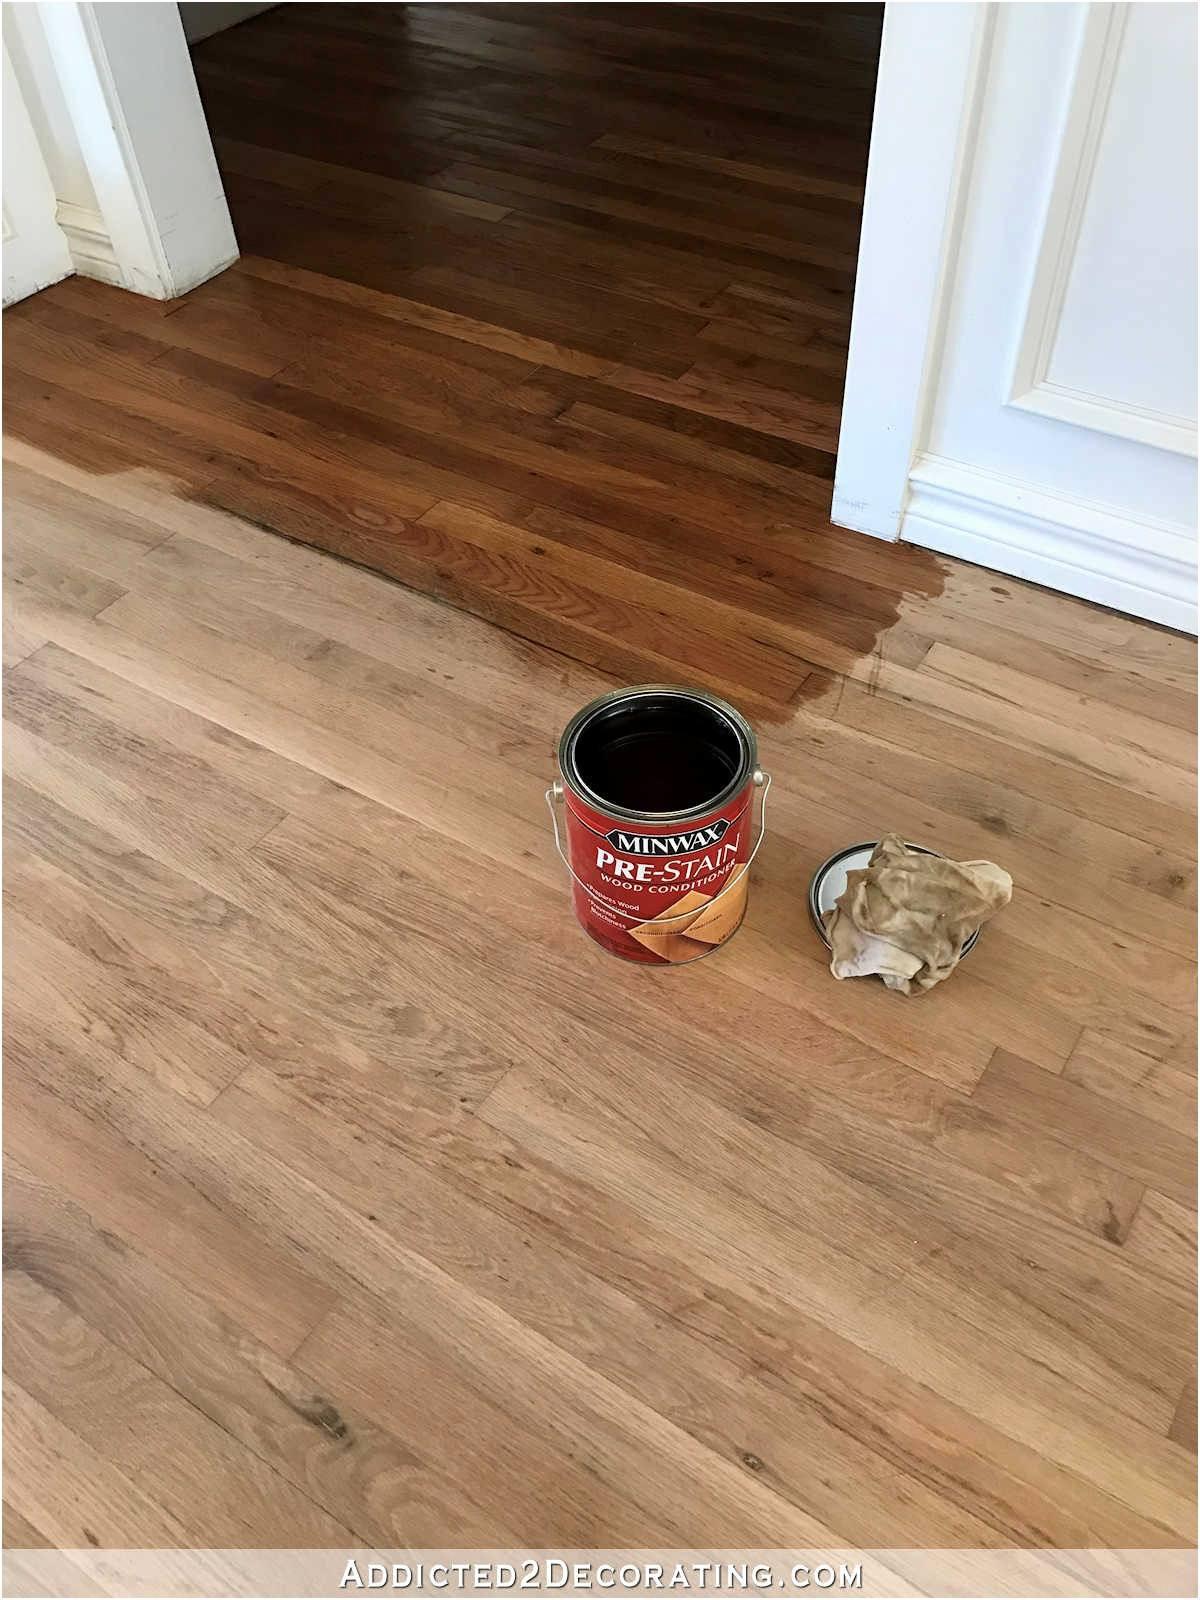 wholesale hardwood flooring prices of inexpensive hardwood flooring 20 cheap underlay for laminate intended for inexpensive hardwood flooring 20 cheap underlay for laminate flooring amazing design